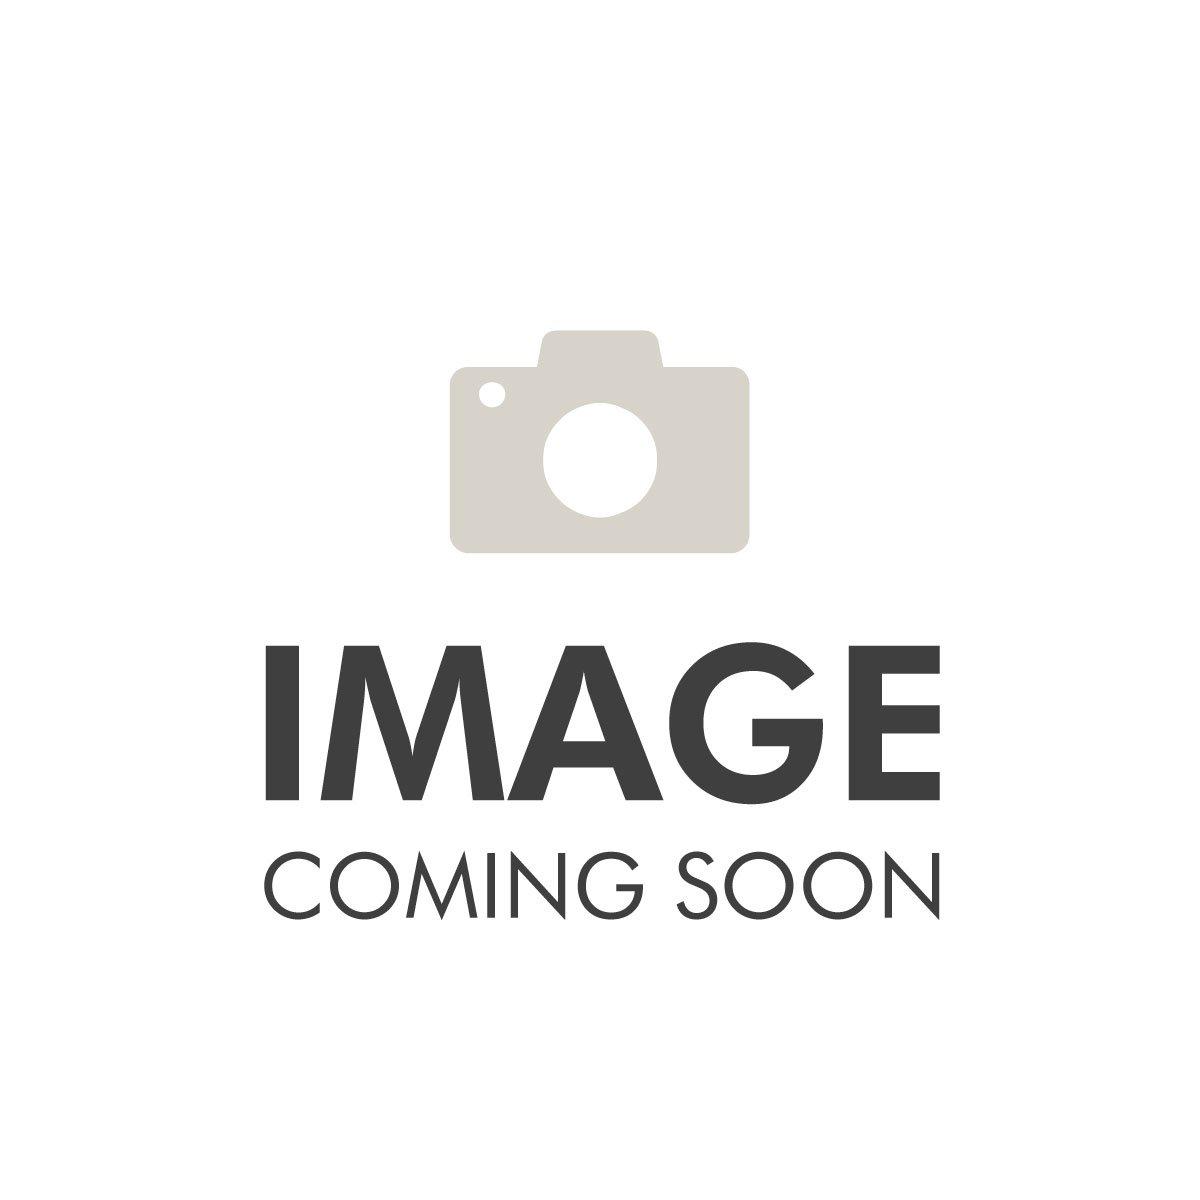 PBT - Fil de lame de fleuret